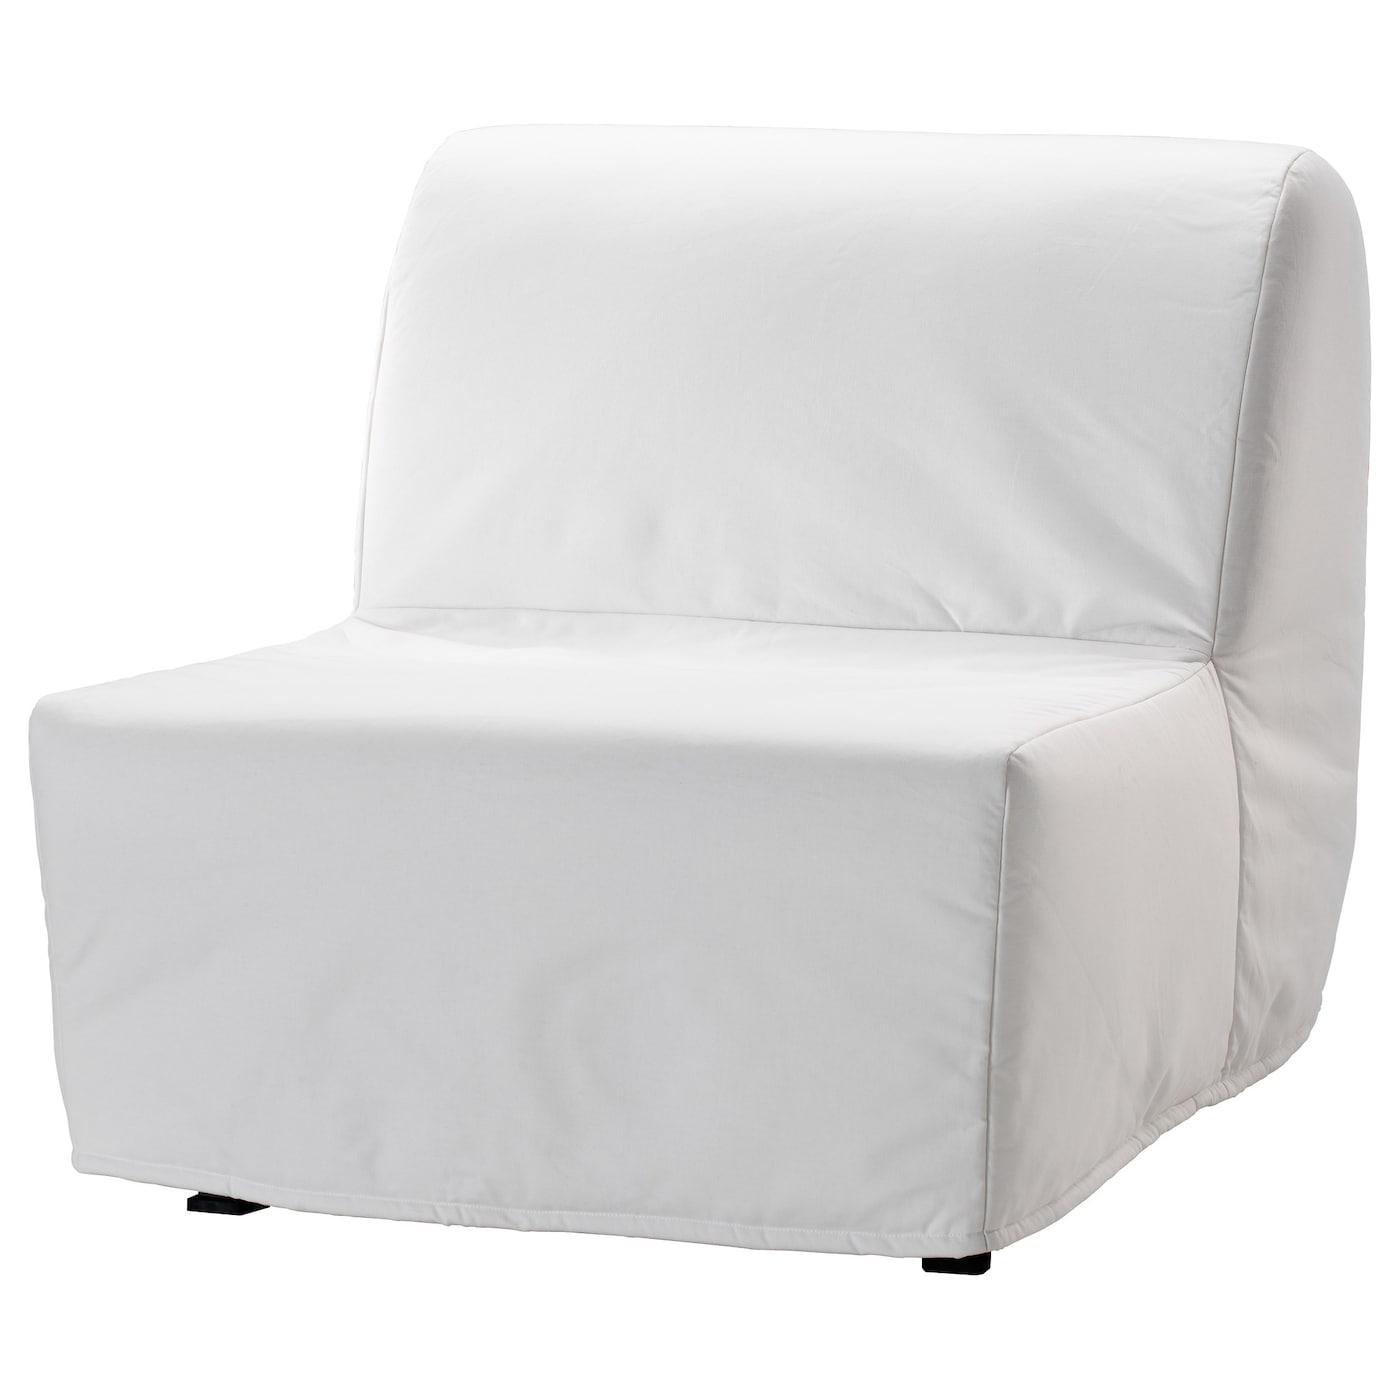 Lycksele Murbo Chair Bed Ransta White Ikea